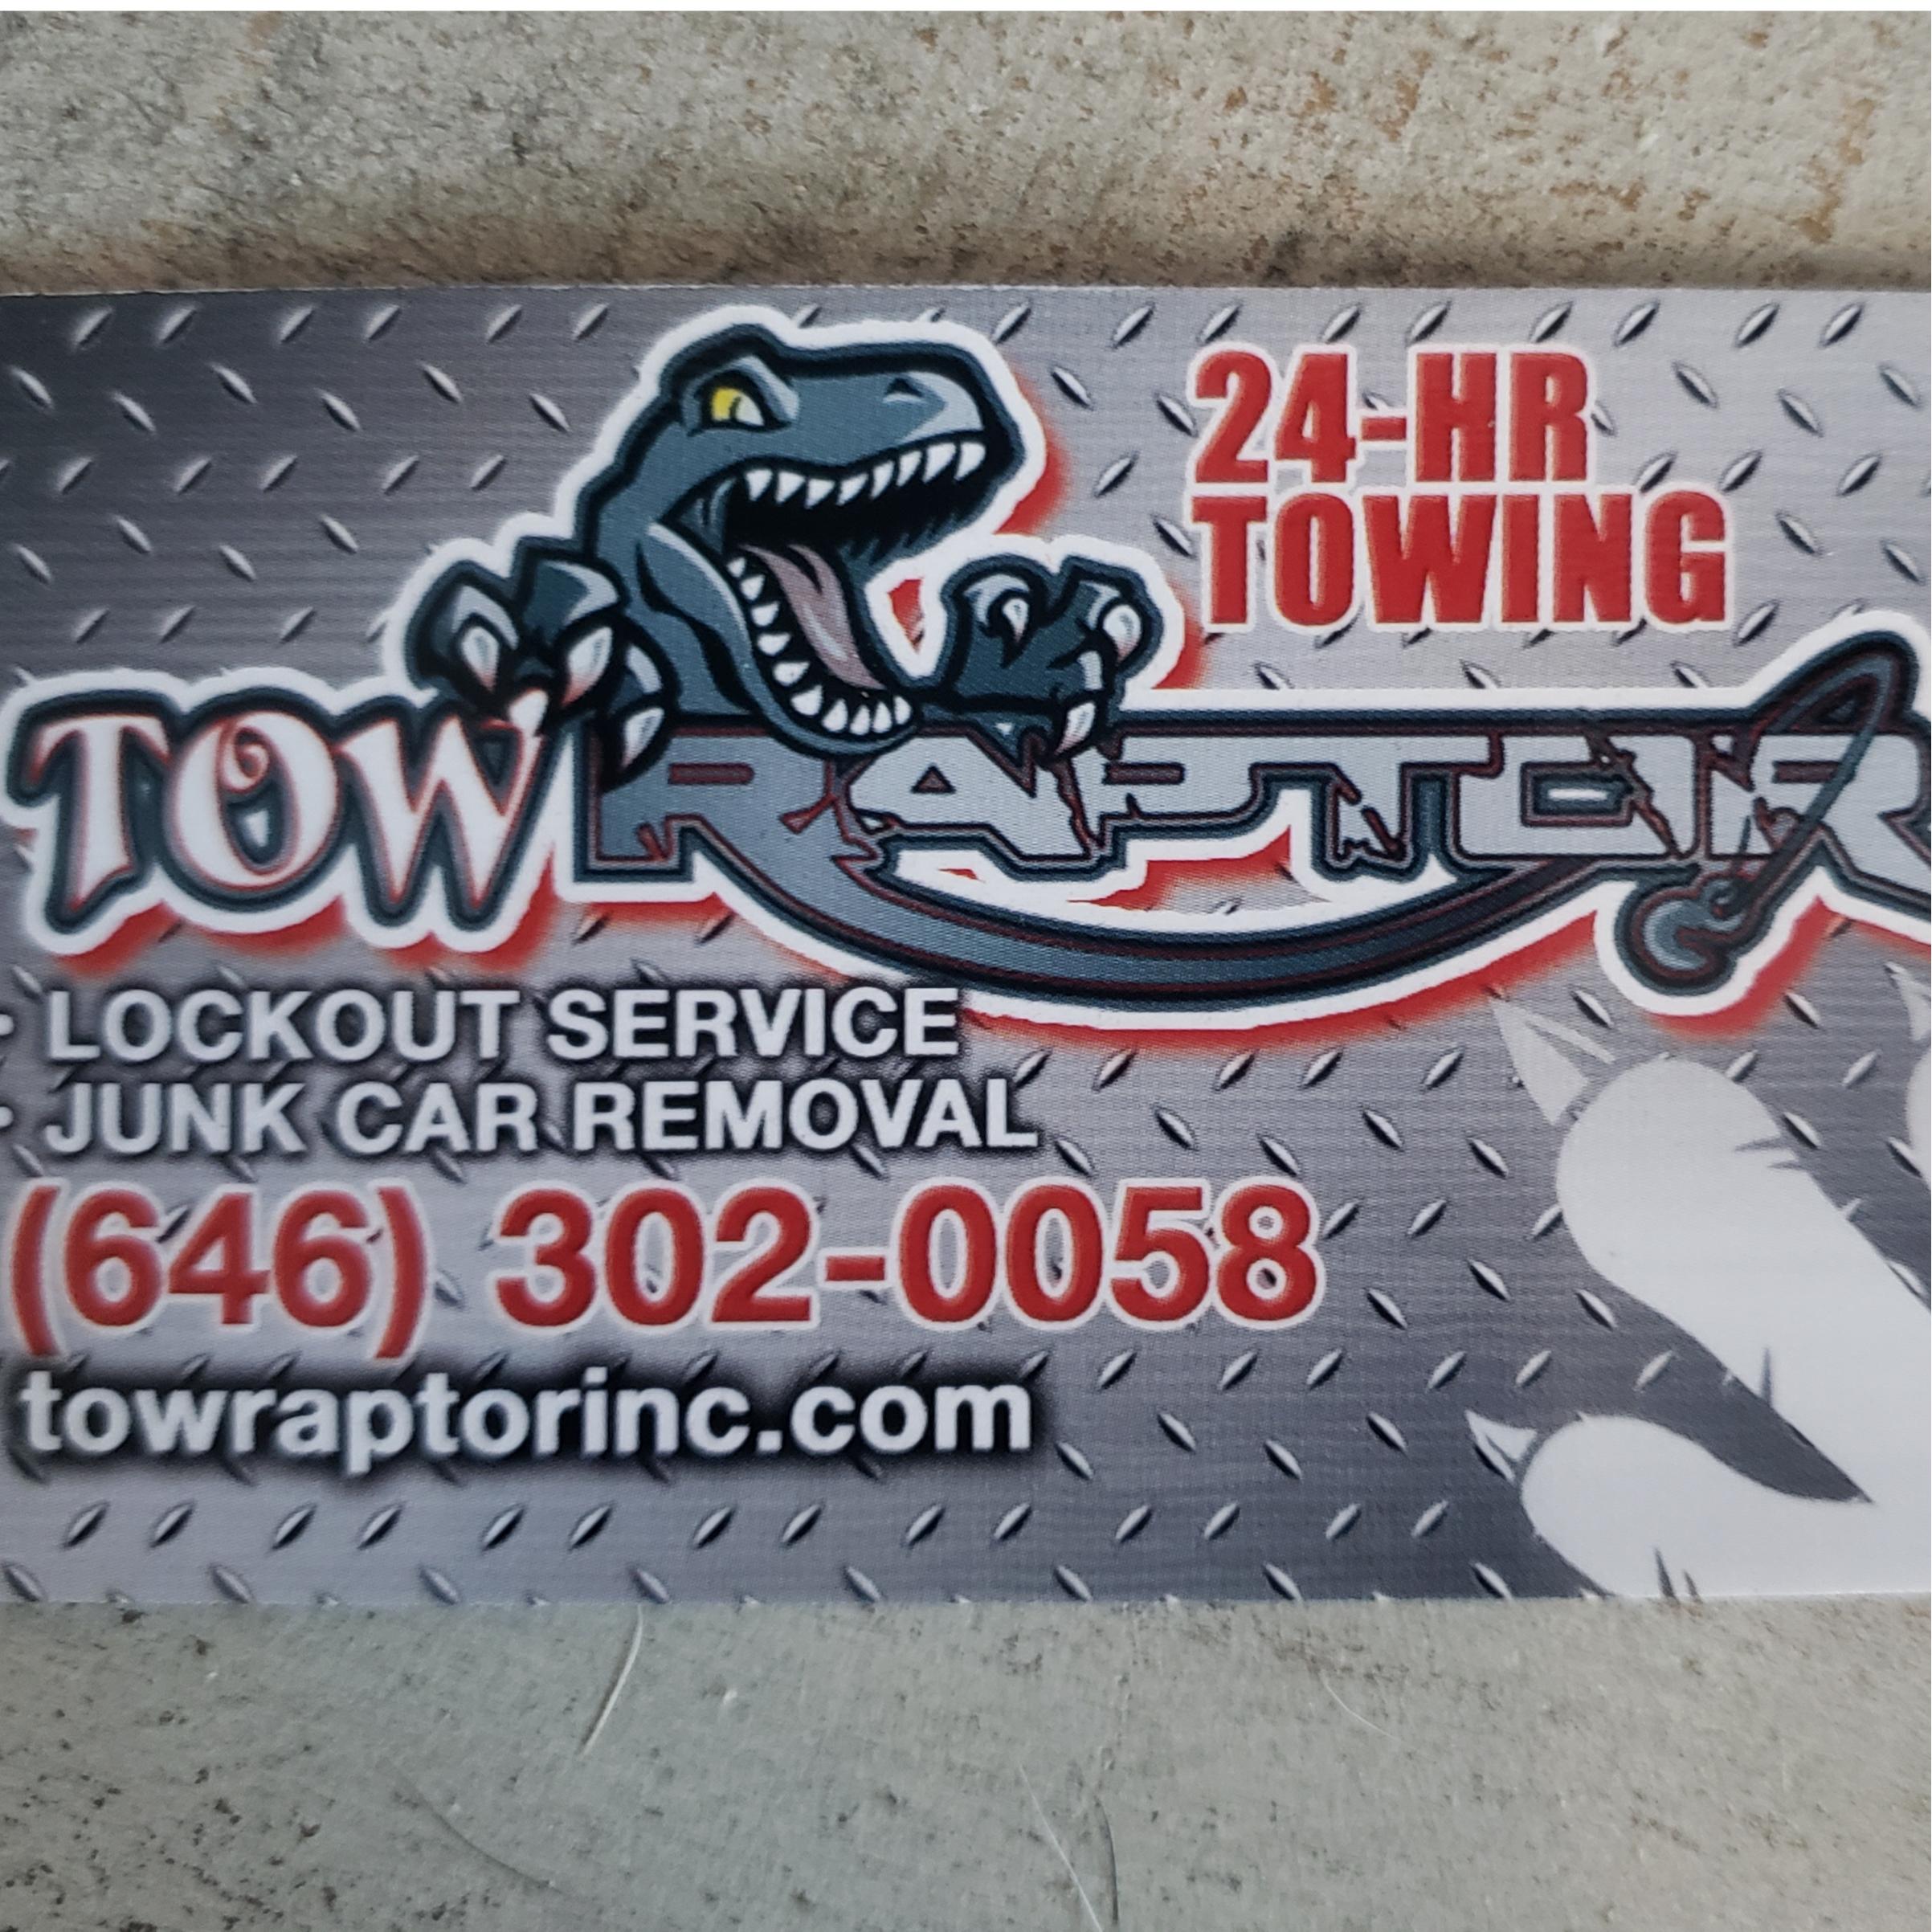 Towraptor inc logo